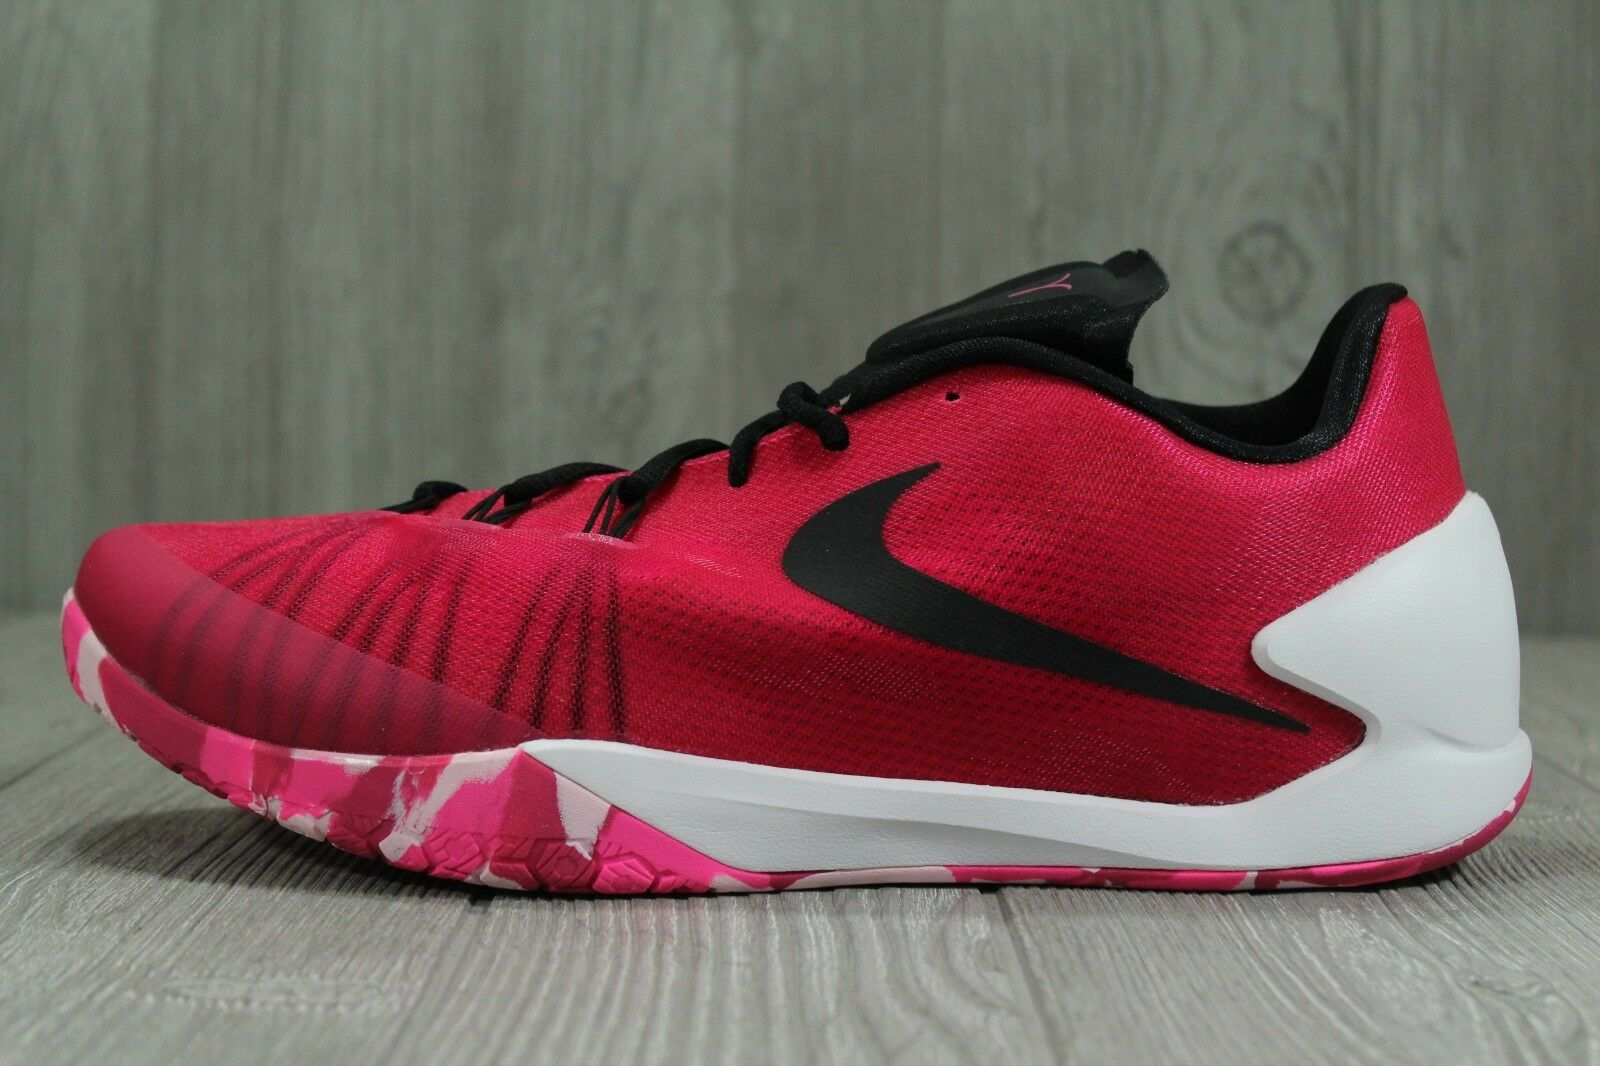 35 RARE Nike HyperChase BCA Harden Breast Cancer Basketball shoes 13 705363-602